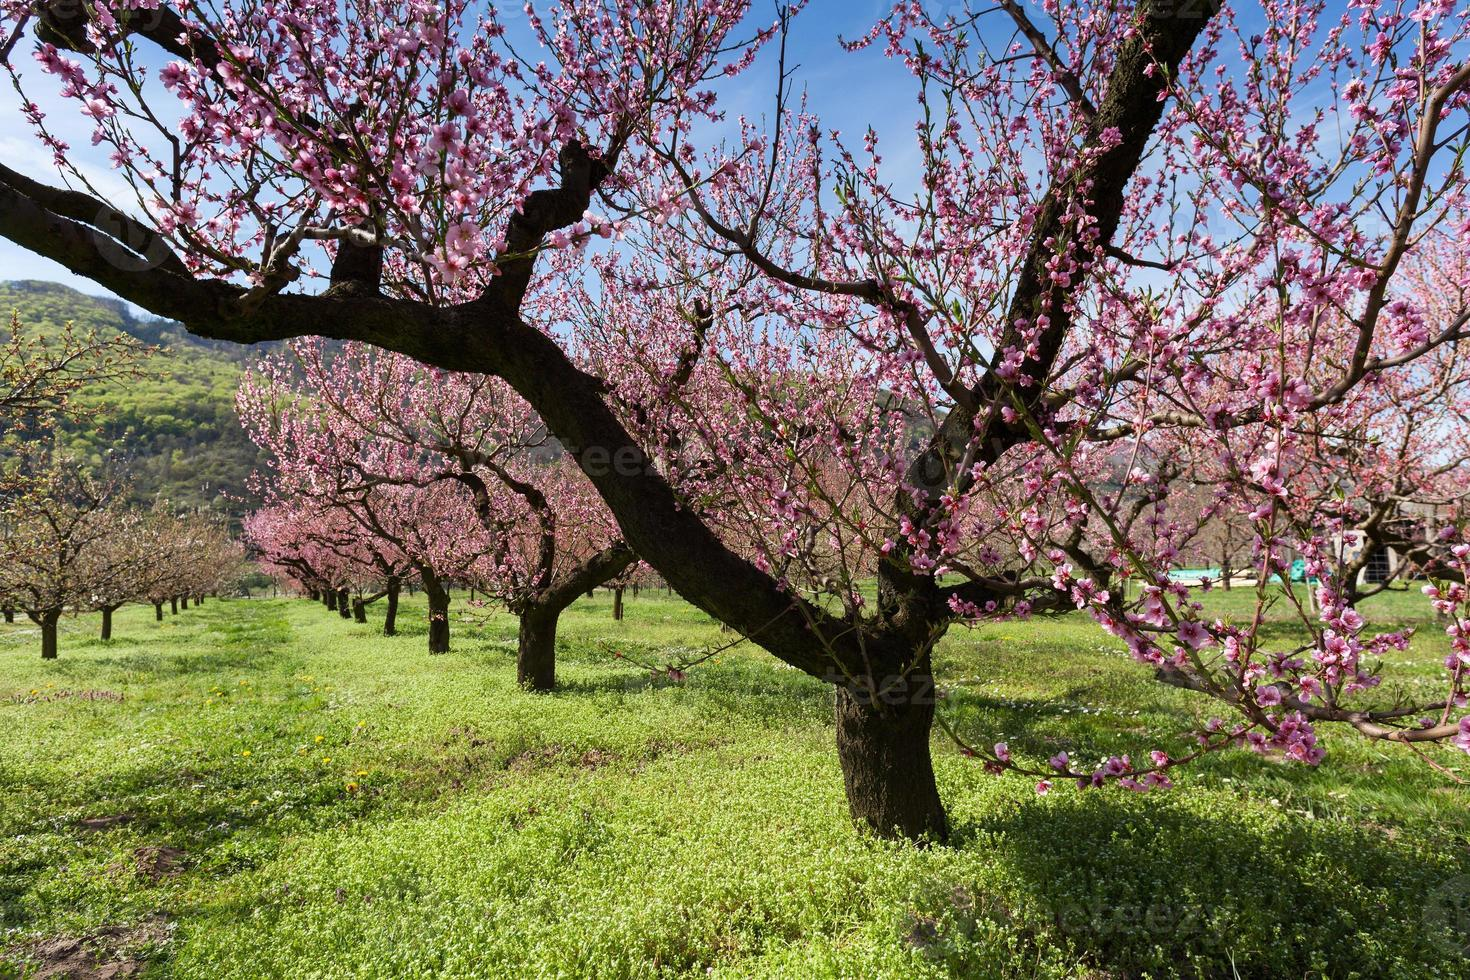 Peach blossoms photo